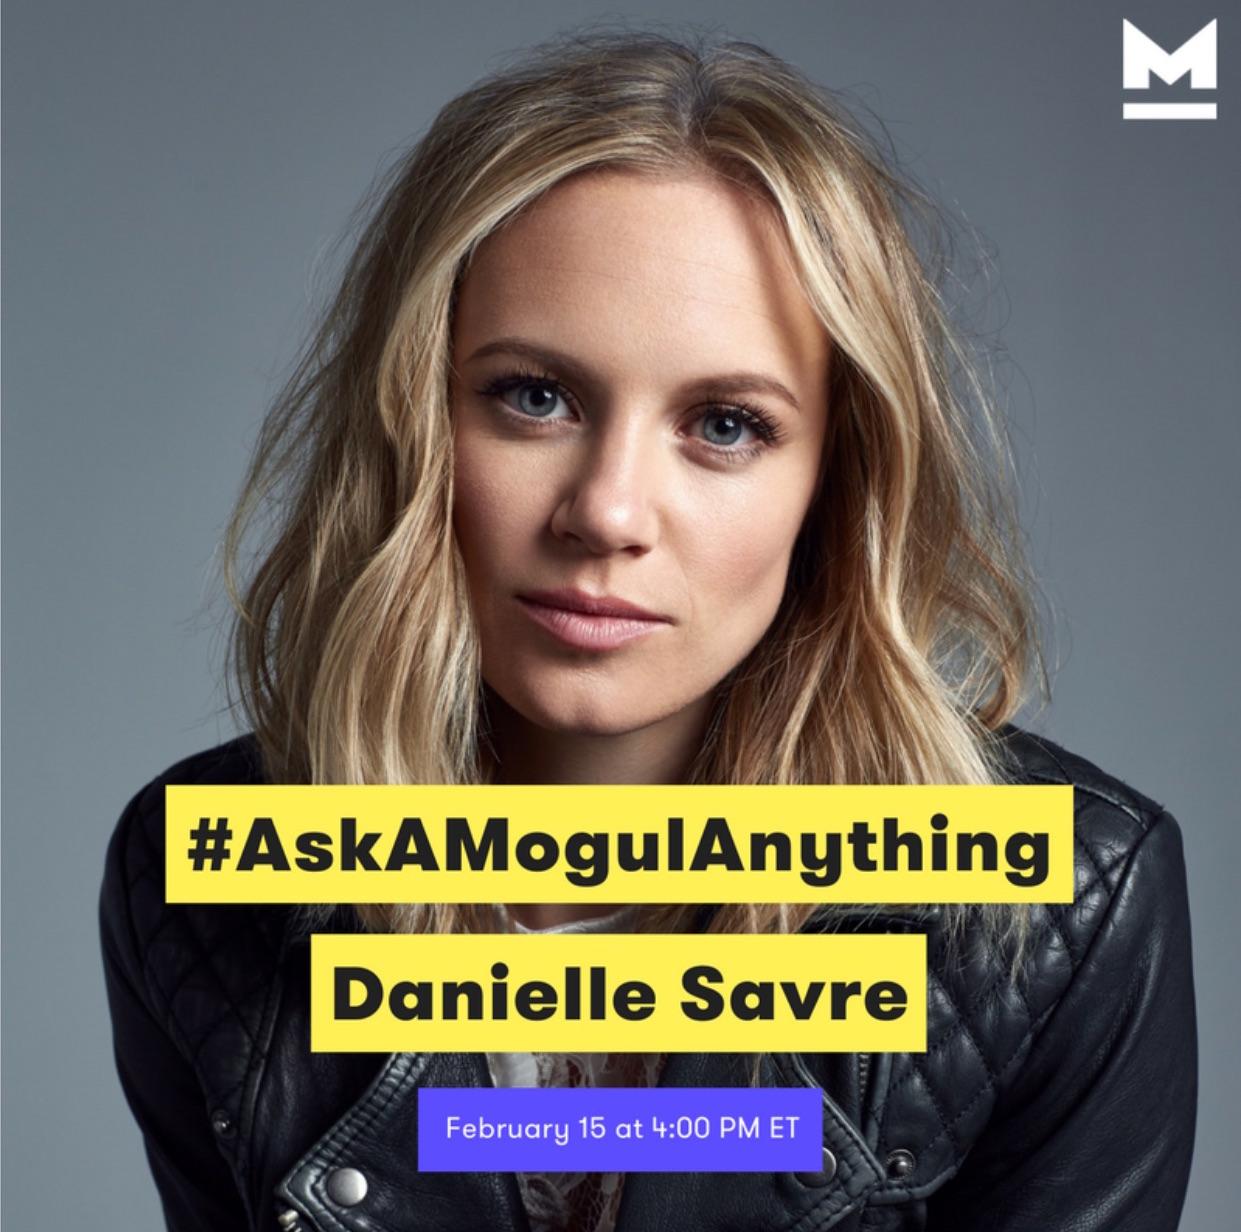 Ask a mogul